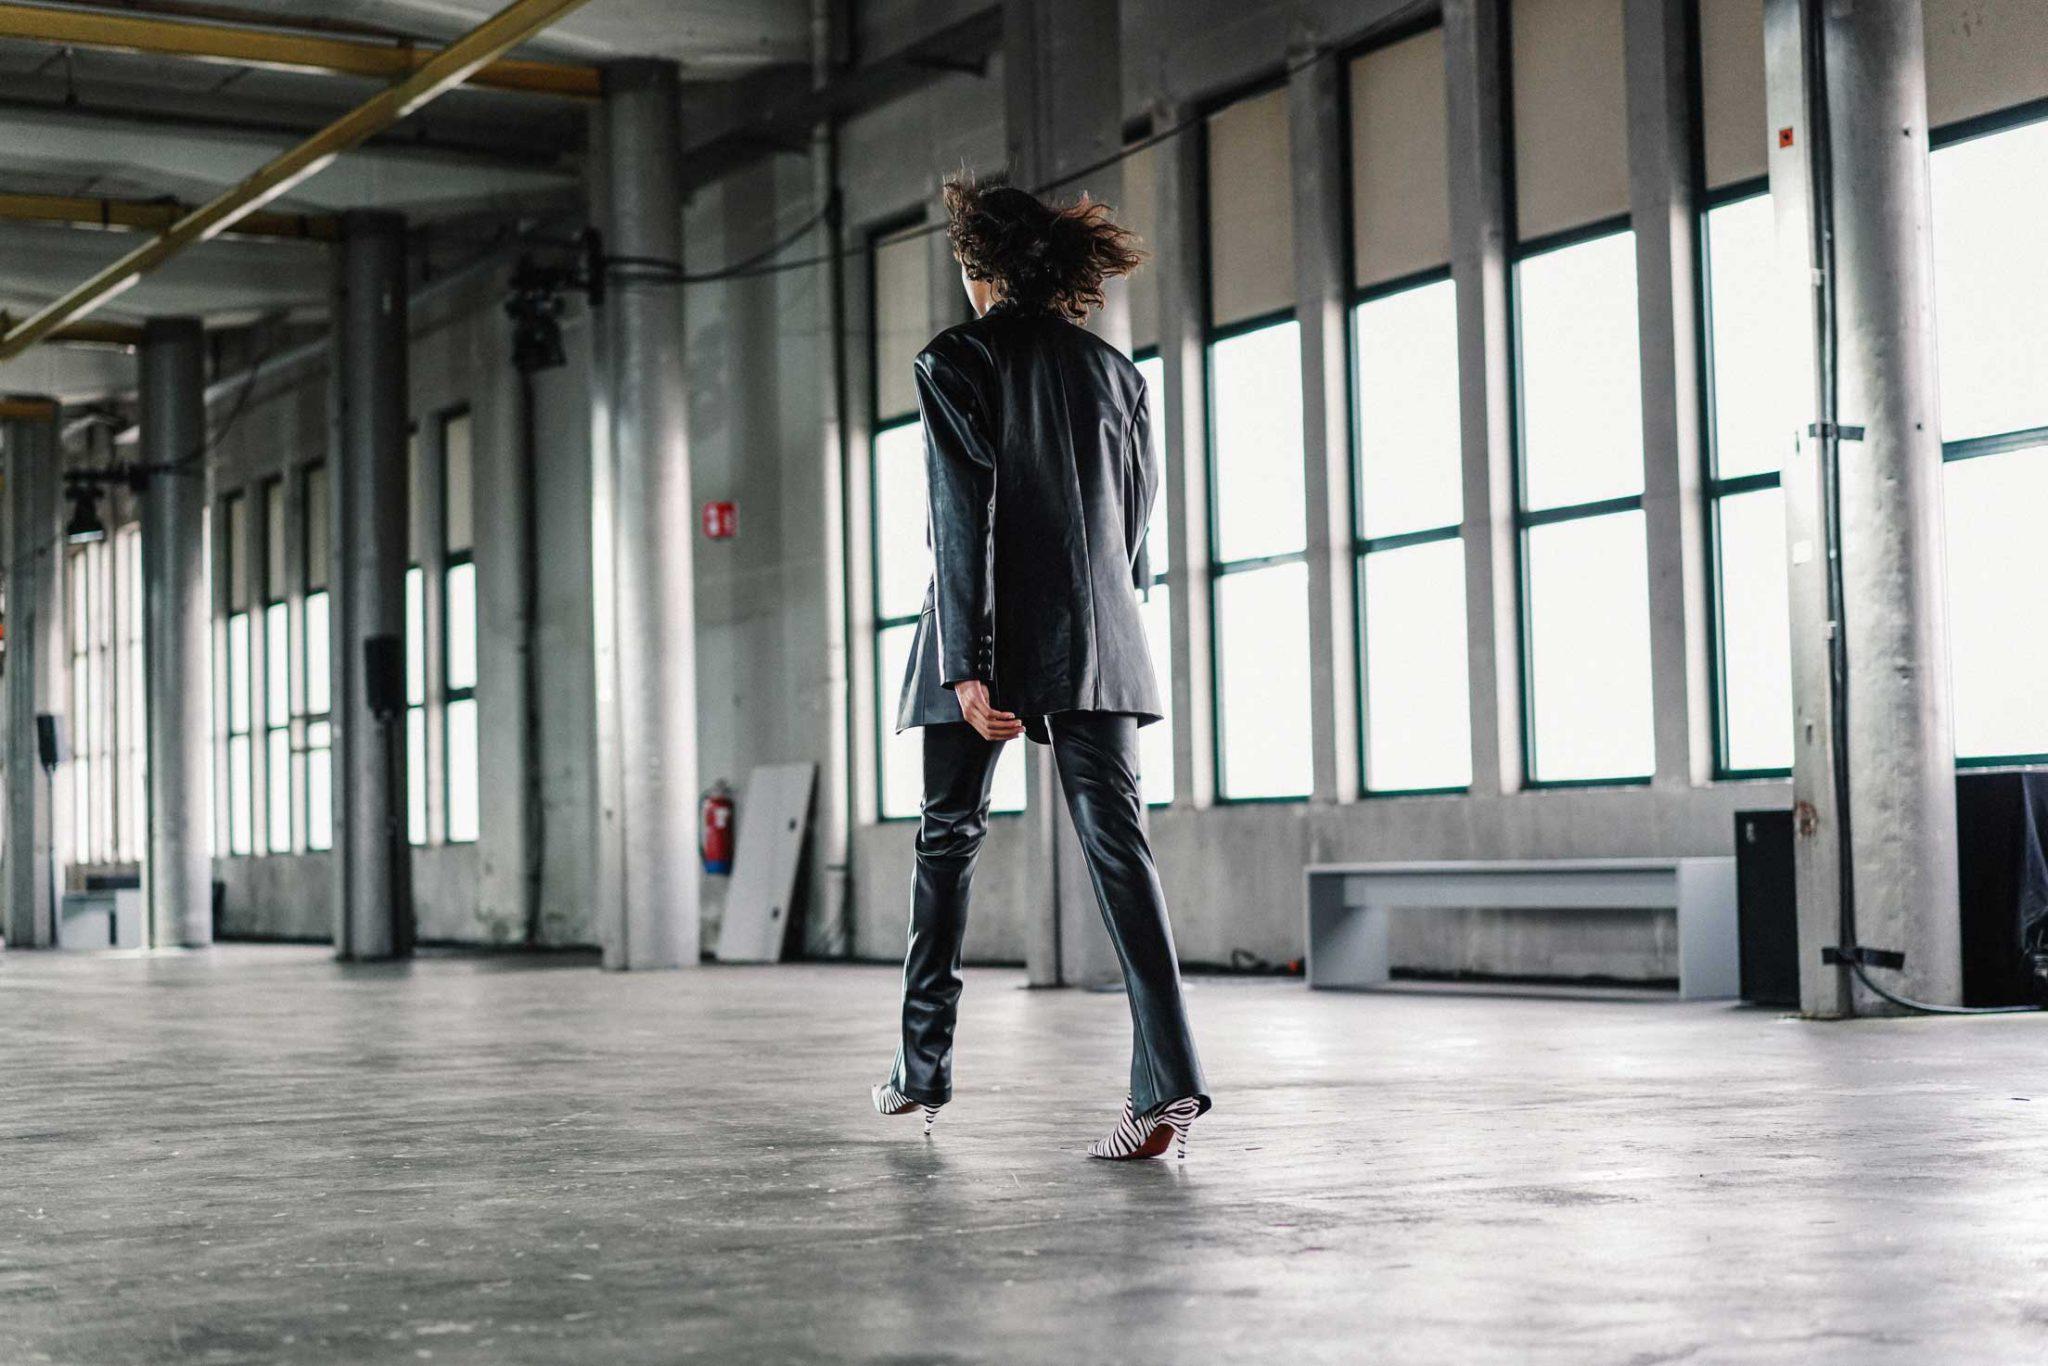 Ilsoo_van_Dijk_Ilsoovandijk_AFW_Toral_Backstage_Amsterdam_Fashion_week_2020_-scaled_9